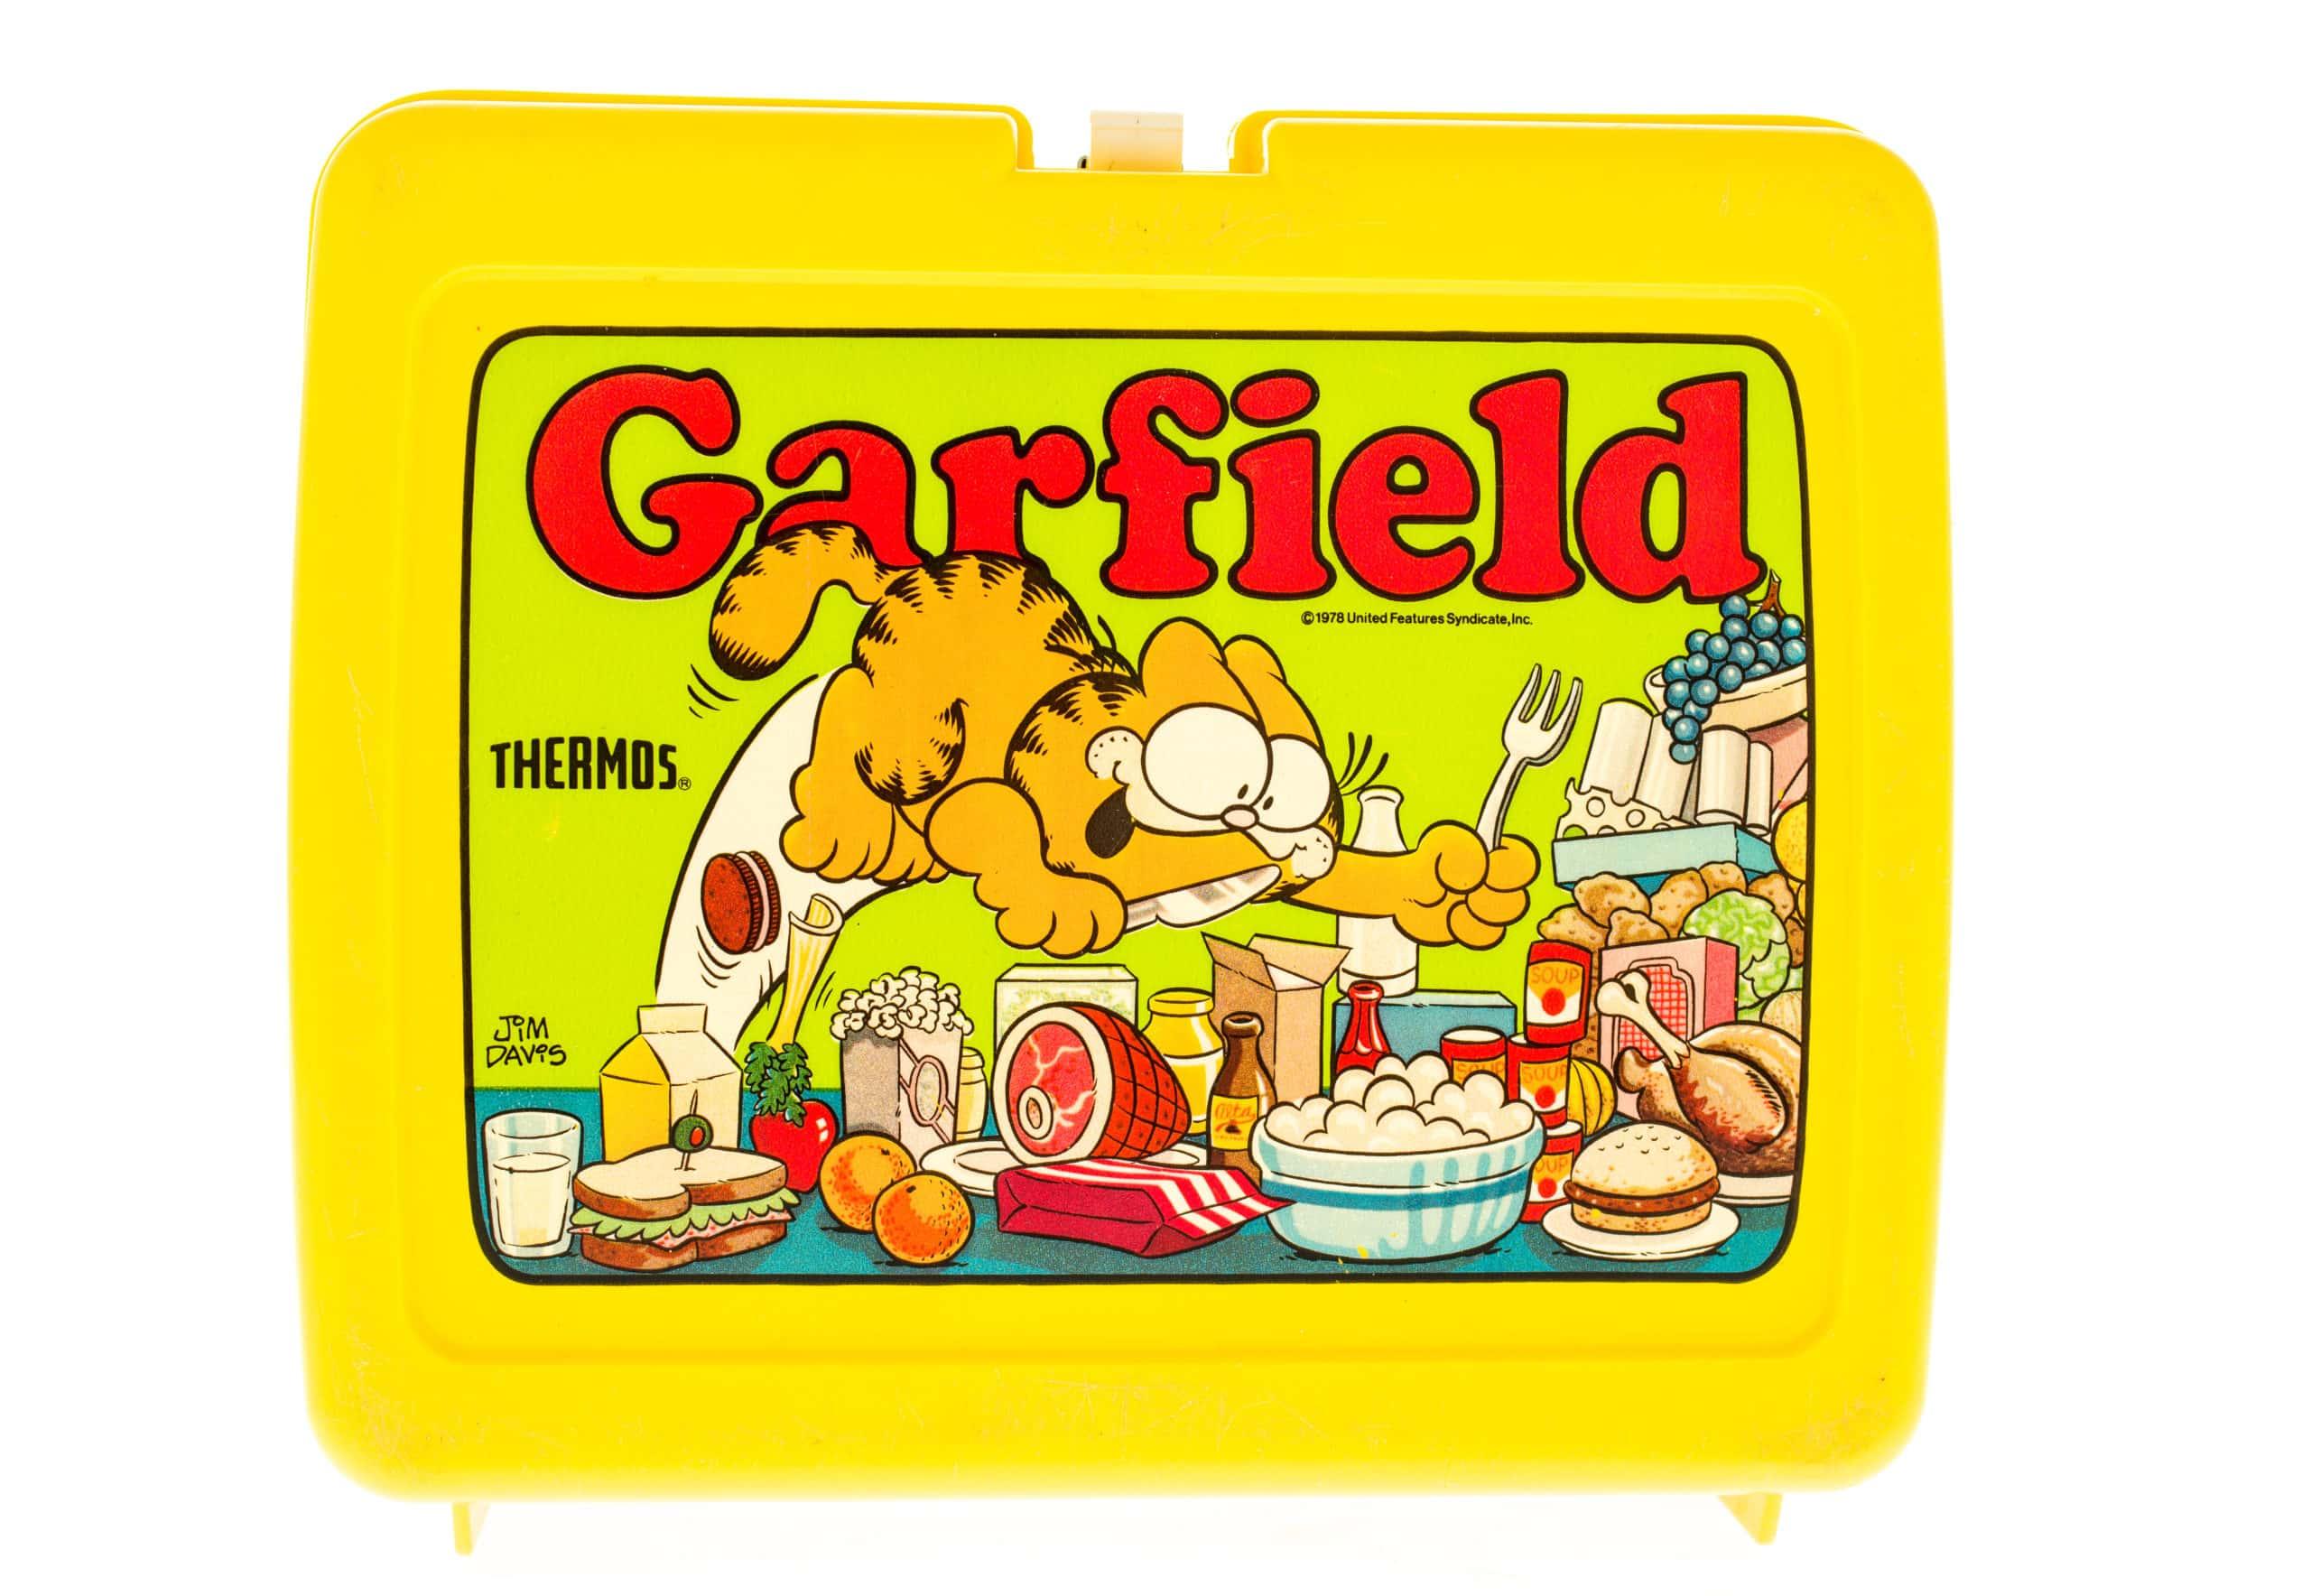 GarfieldEATS Editorial